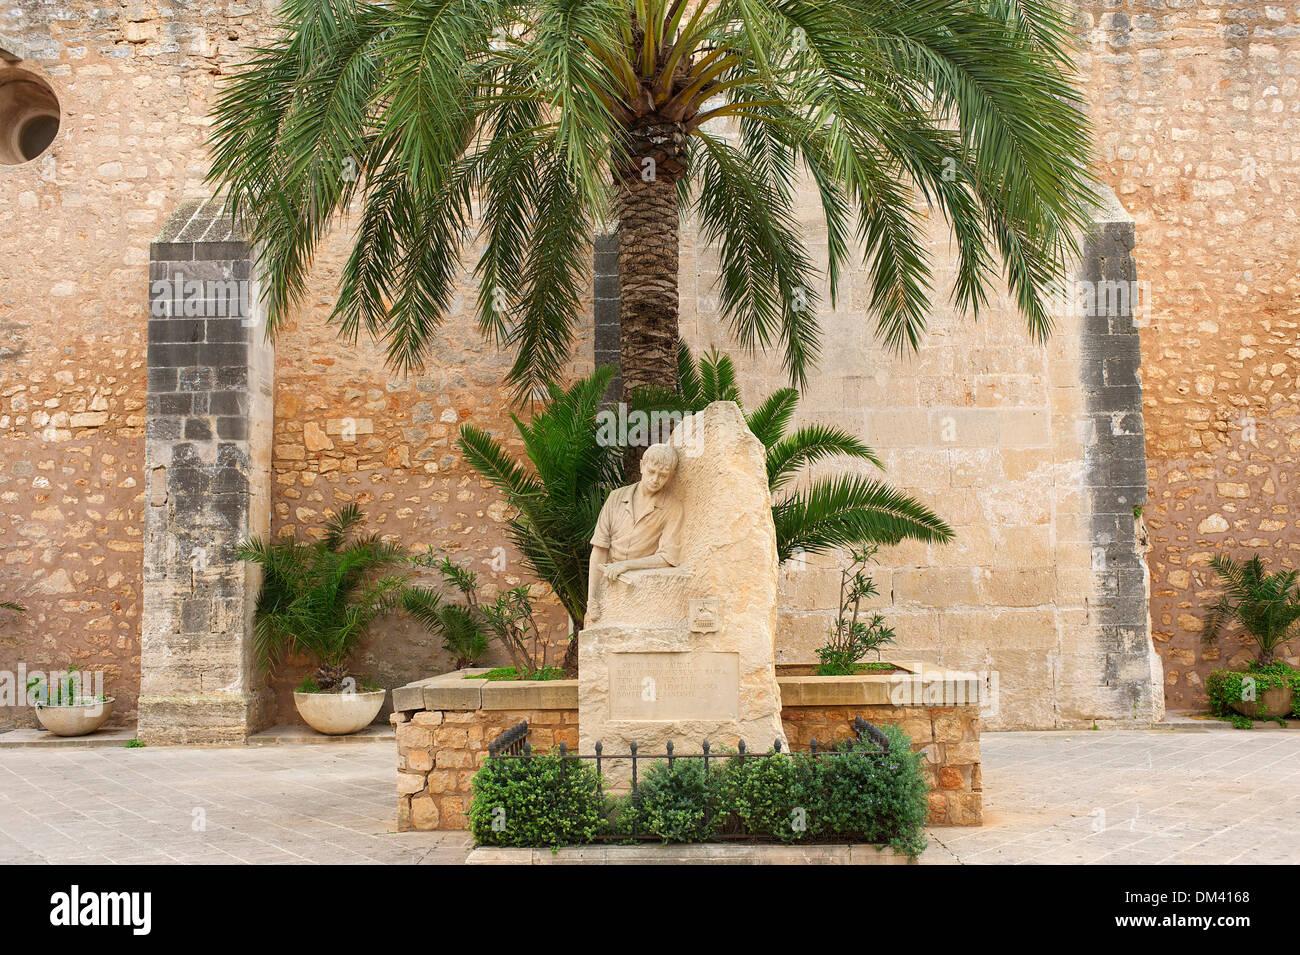 Balearen Mallorca Spanien Europa Statue Skulptur Figur Geschichtskultur kulturellen Fähigkeiten Kunstwerk Kunst Skulptur Stockbild